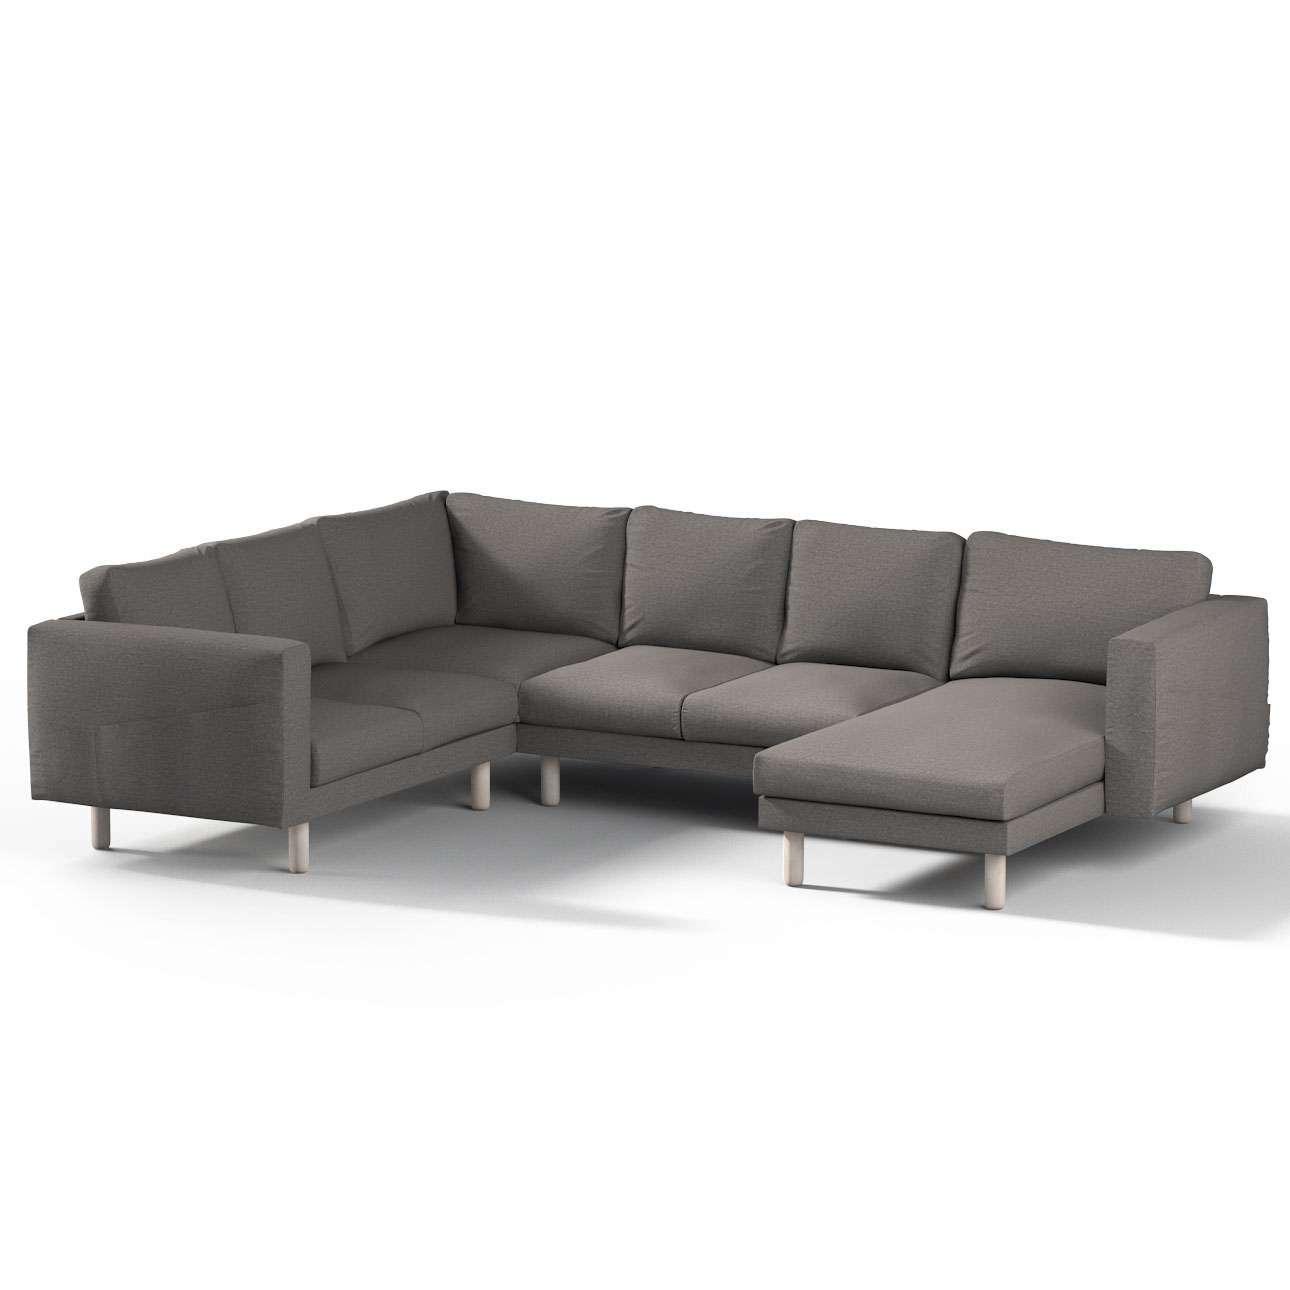 norsborg bezug f r 5 sitzer ecksofa mit recamiere grau dekoria. Black Bedroom Furniture Sets. Home Design Ideas